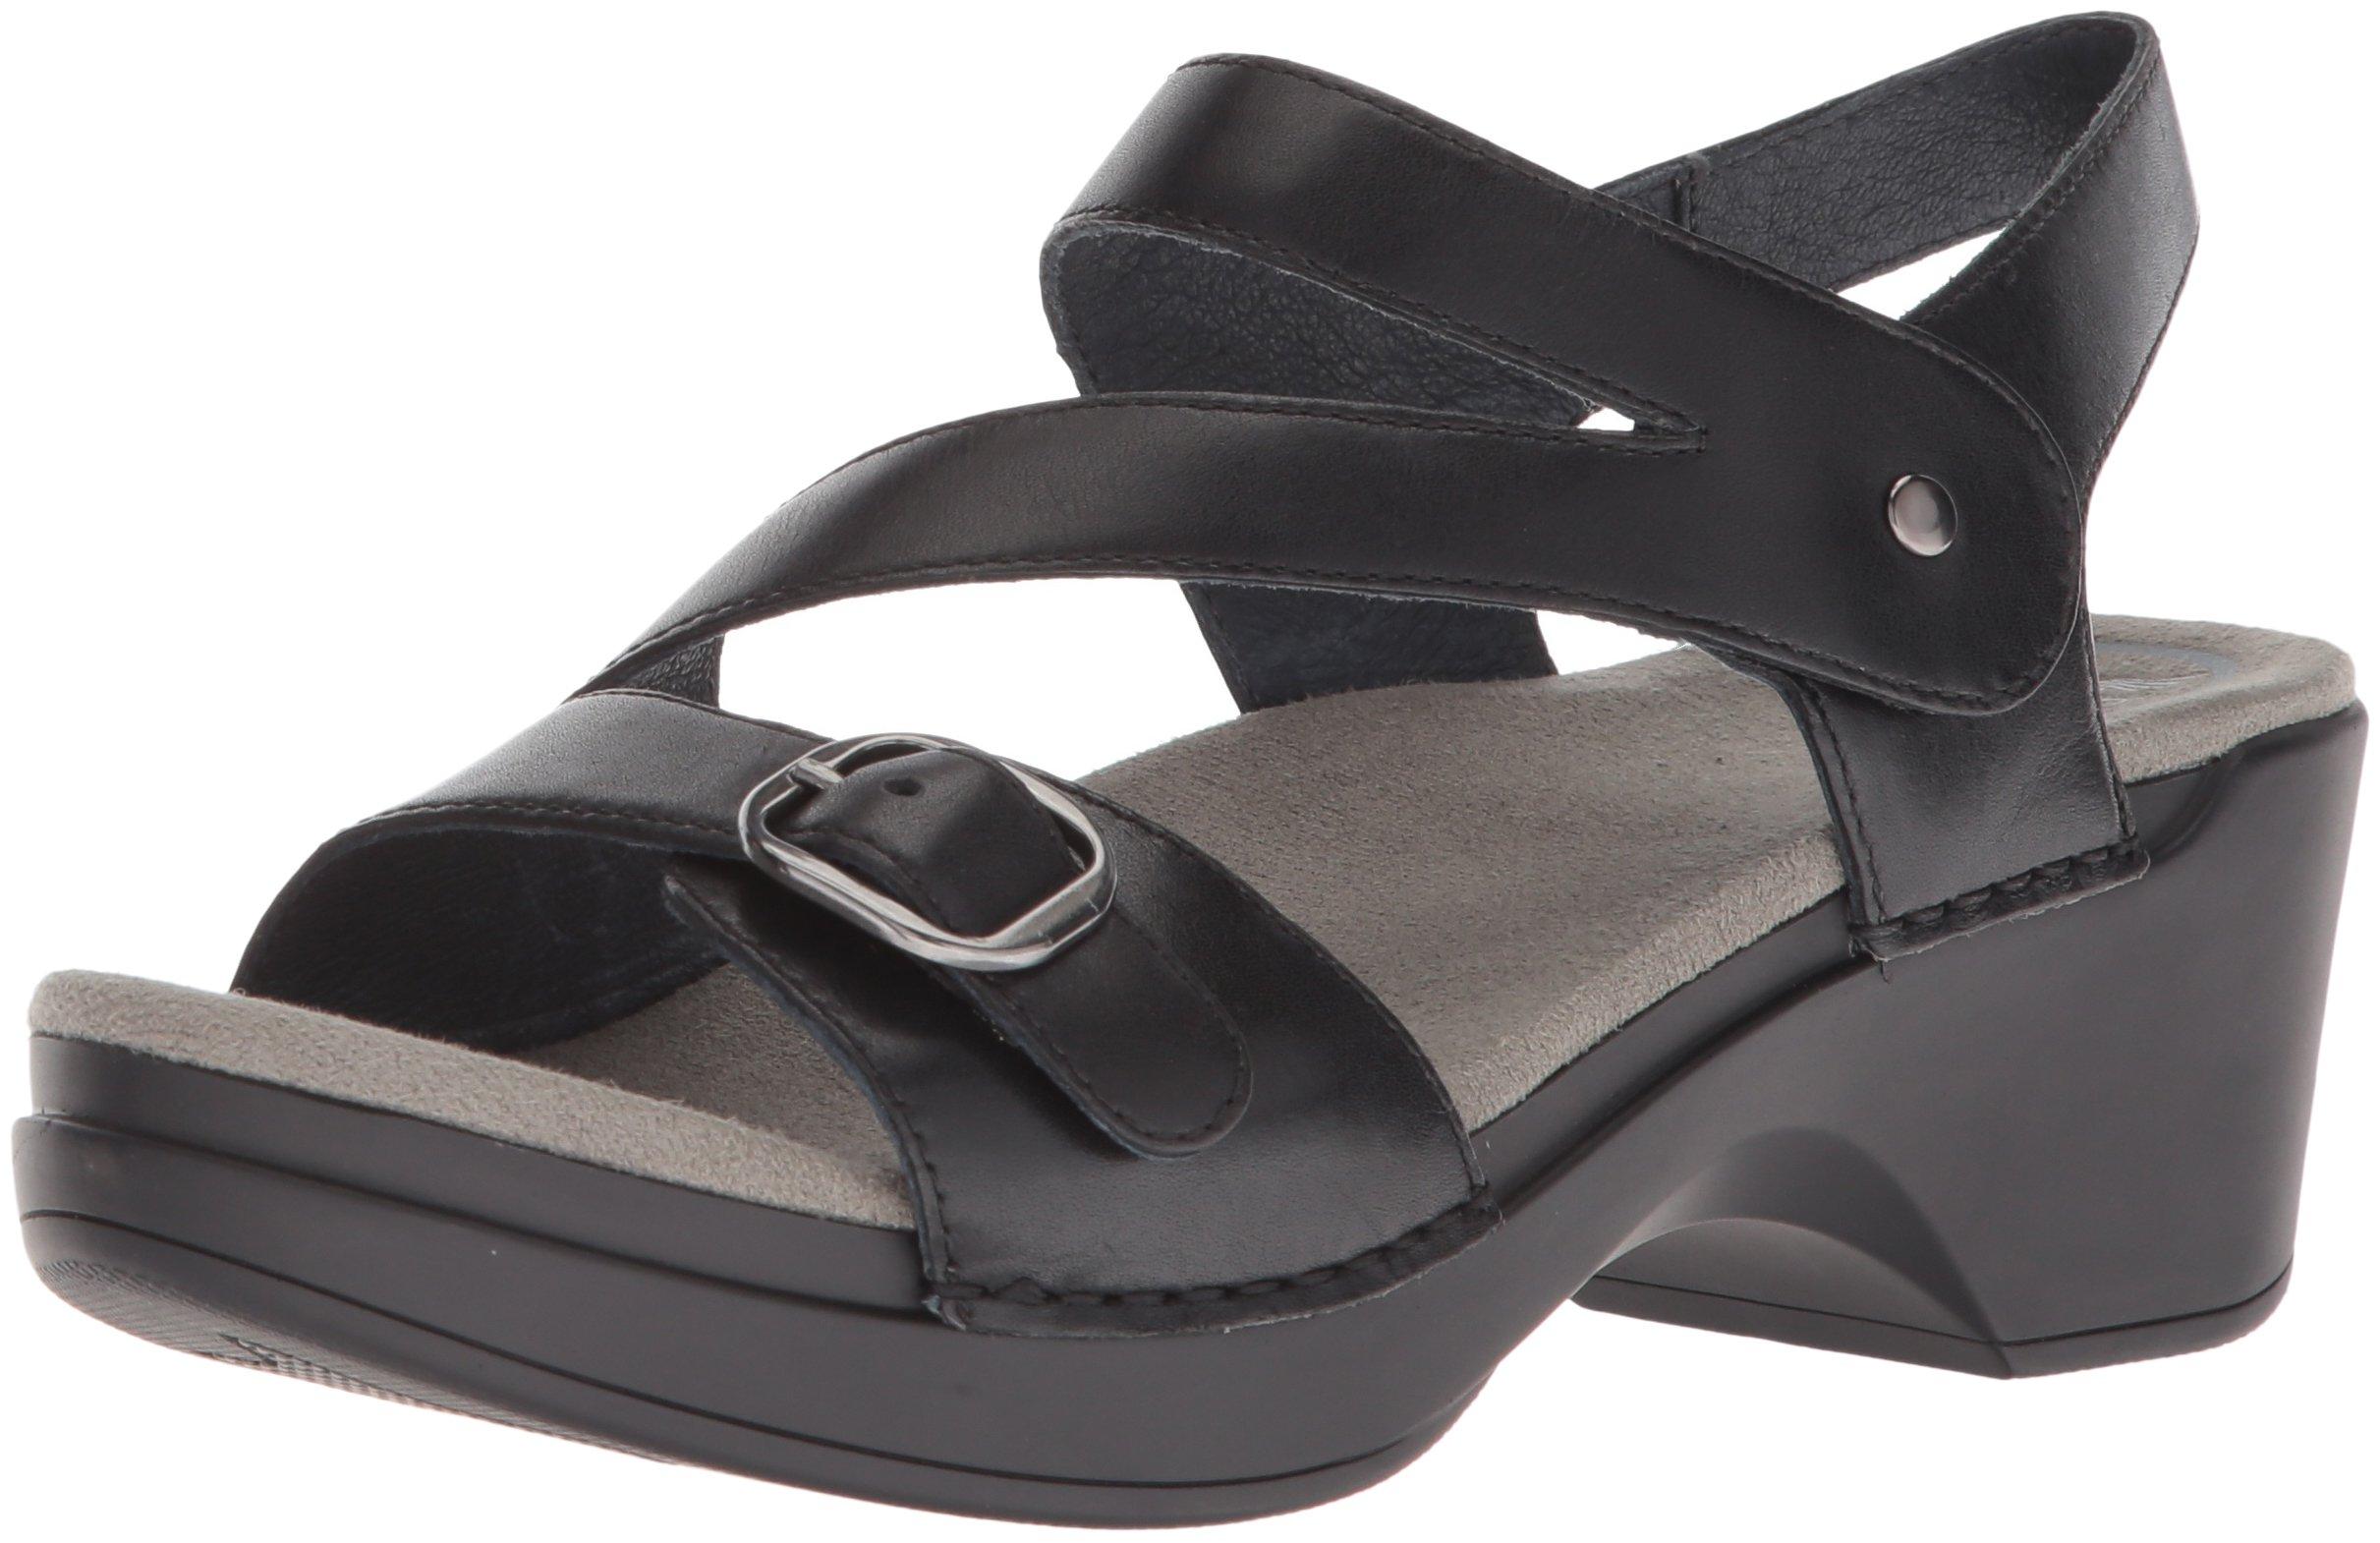 Dansko Women's Shari Flat Sandal, Black Full Grain, 38 M EU (7.5-8 US)